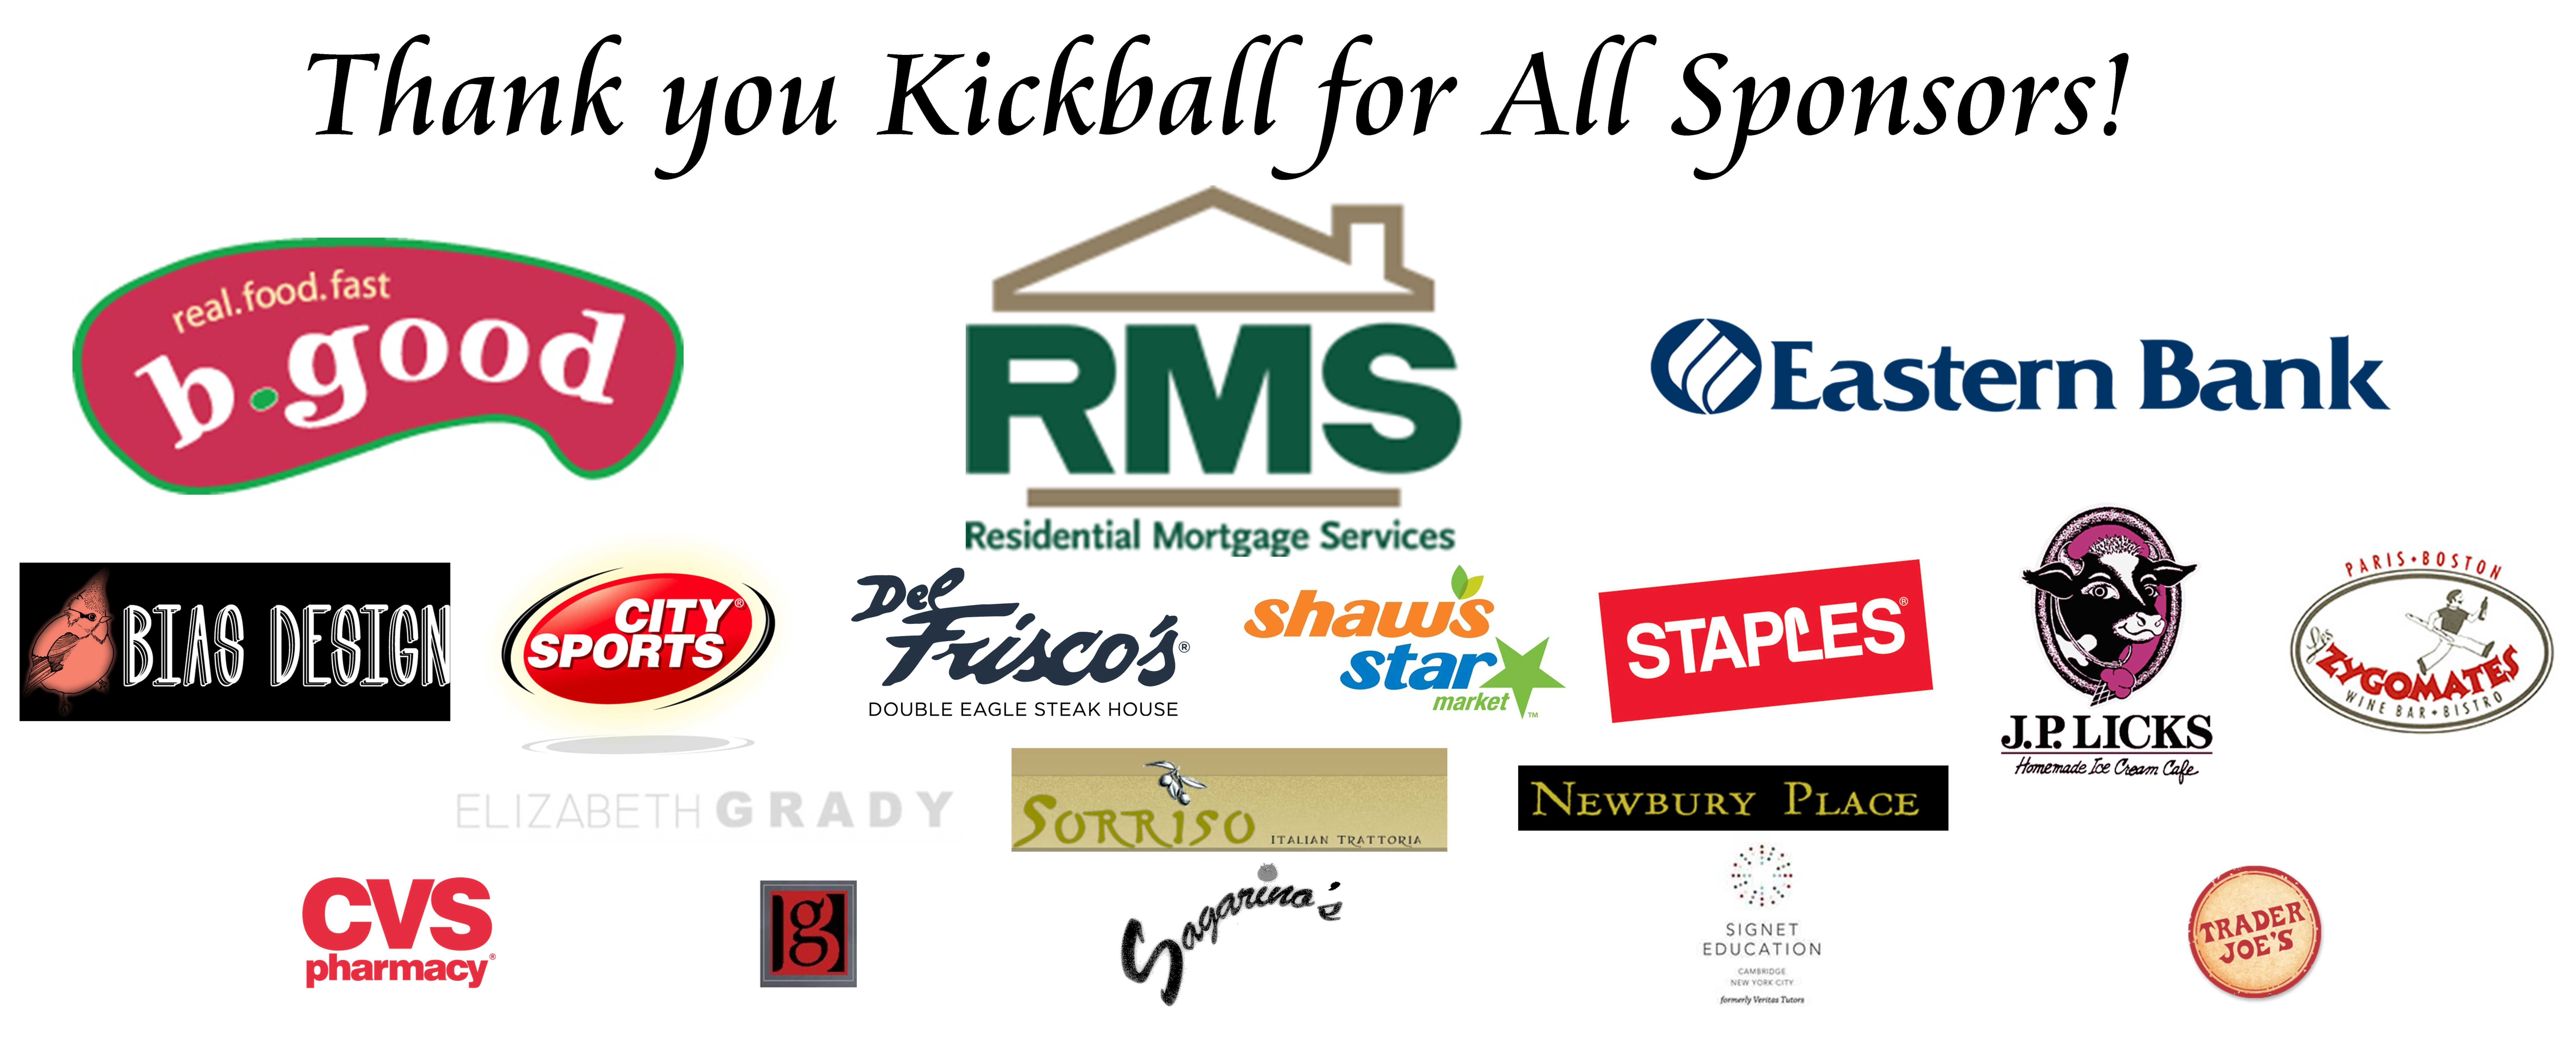 062014 Final Kickball Slider